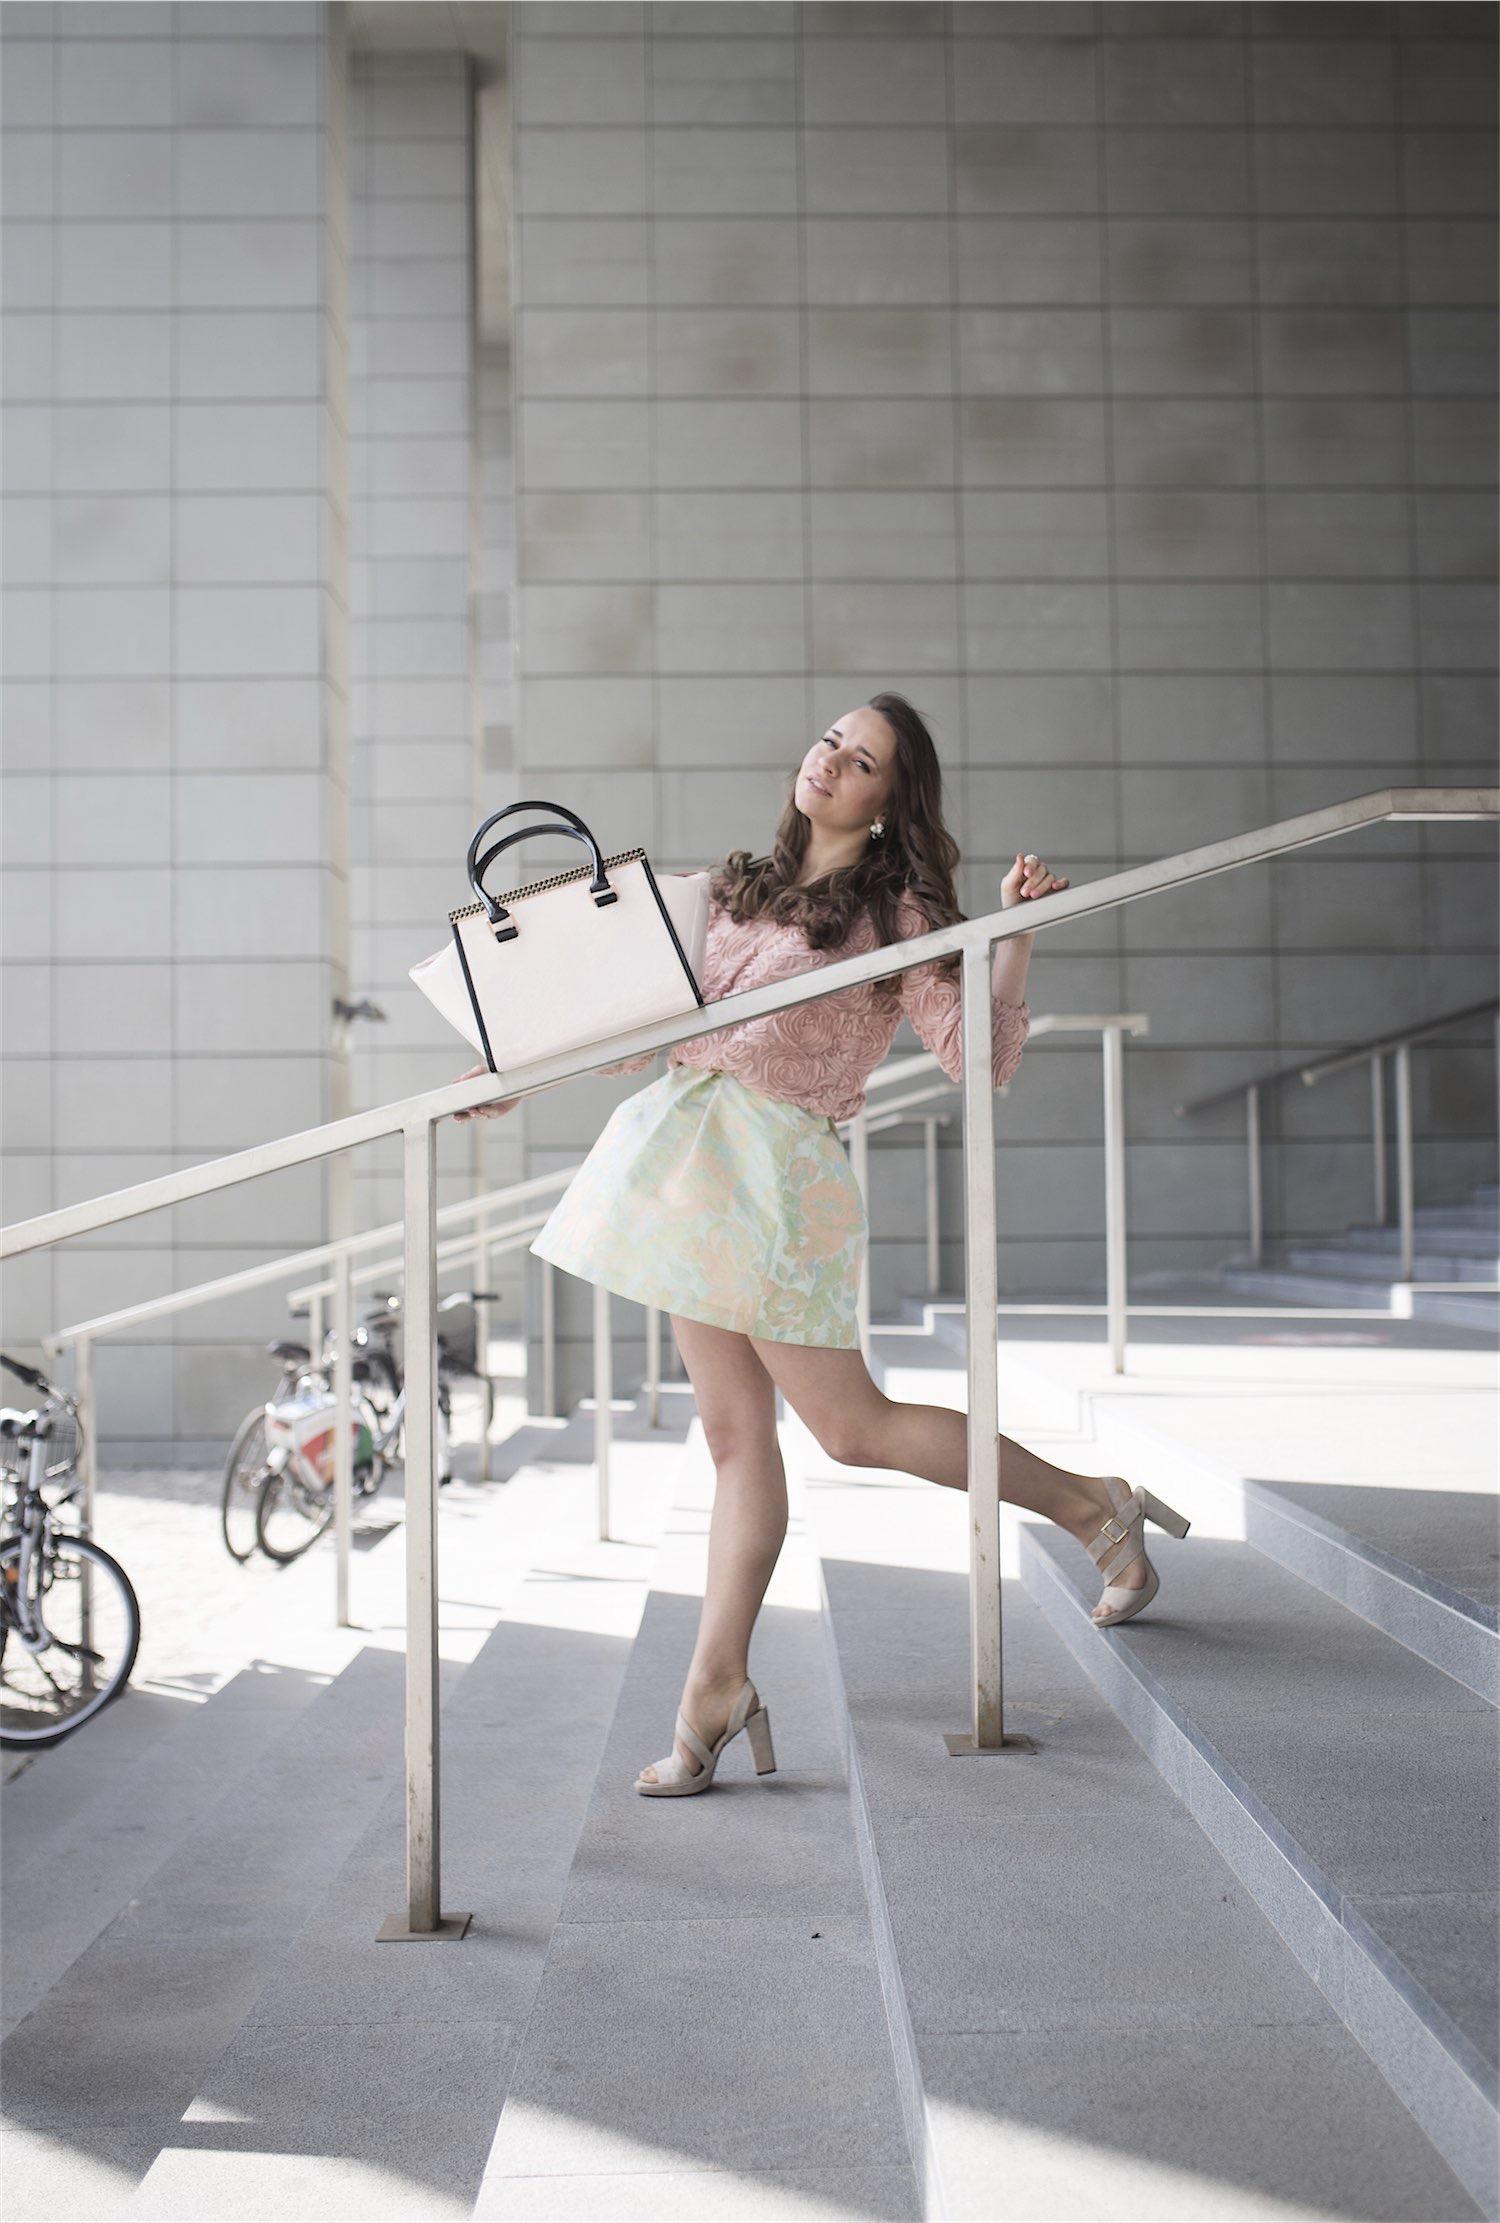 fashion-blogger-kateillustrate-tedbaker-skirt4